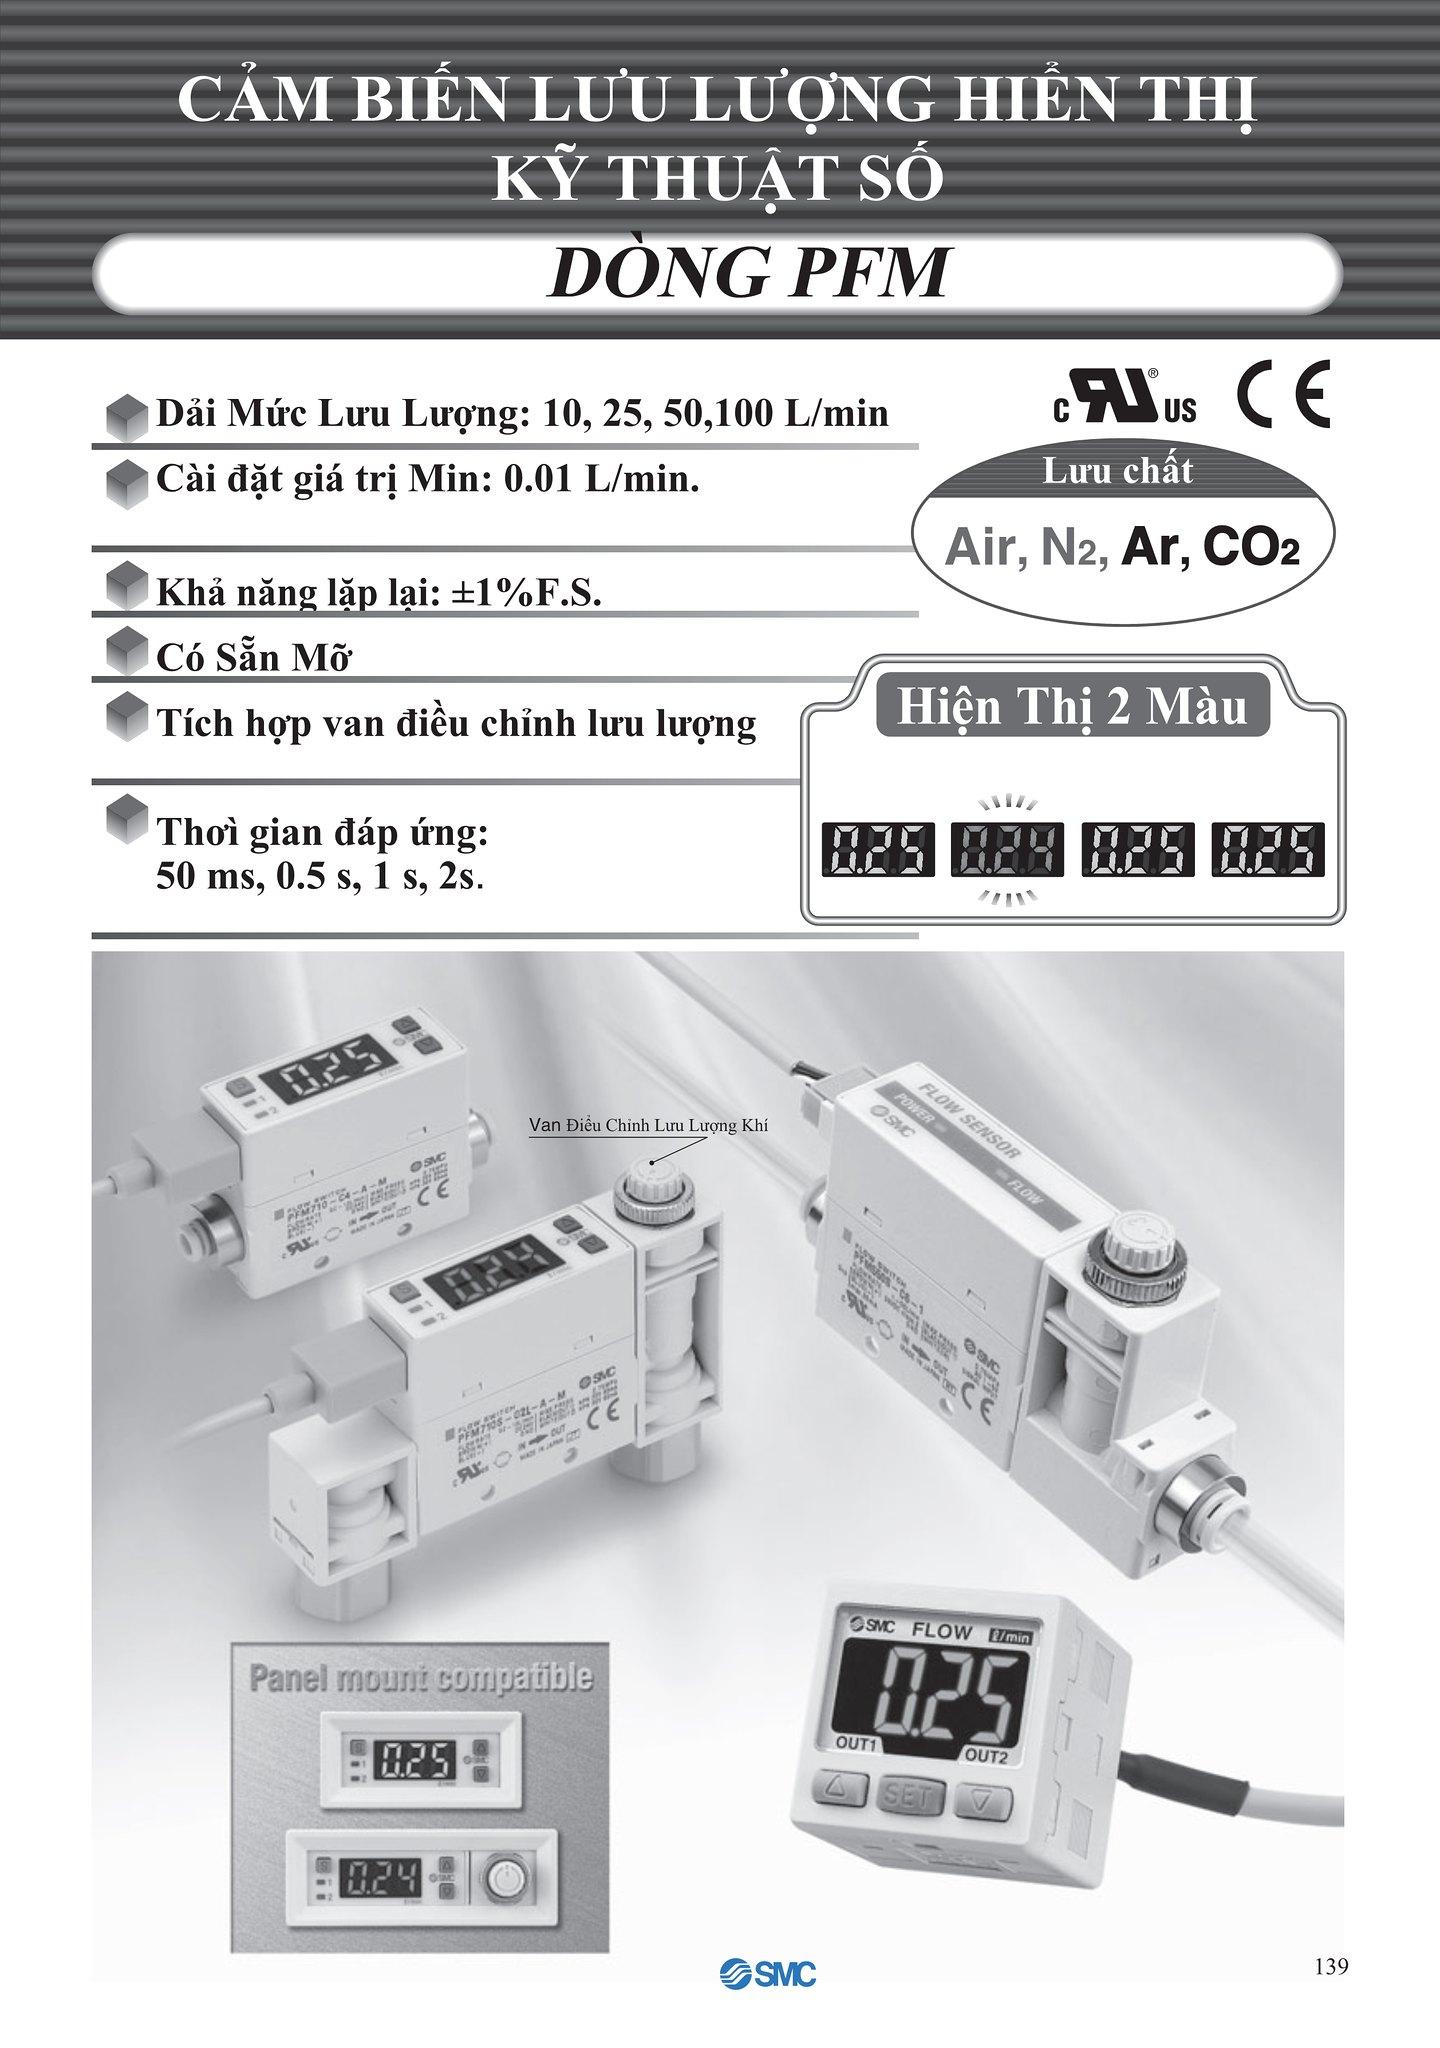 thông tin cảm biến áp suất SMC